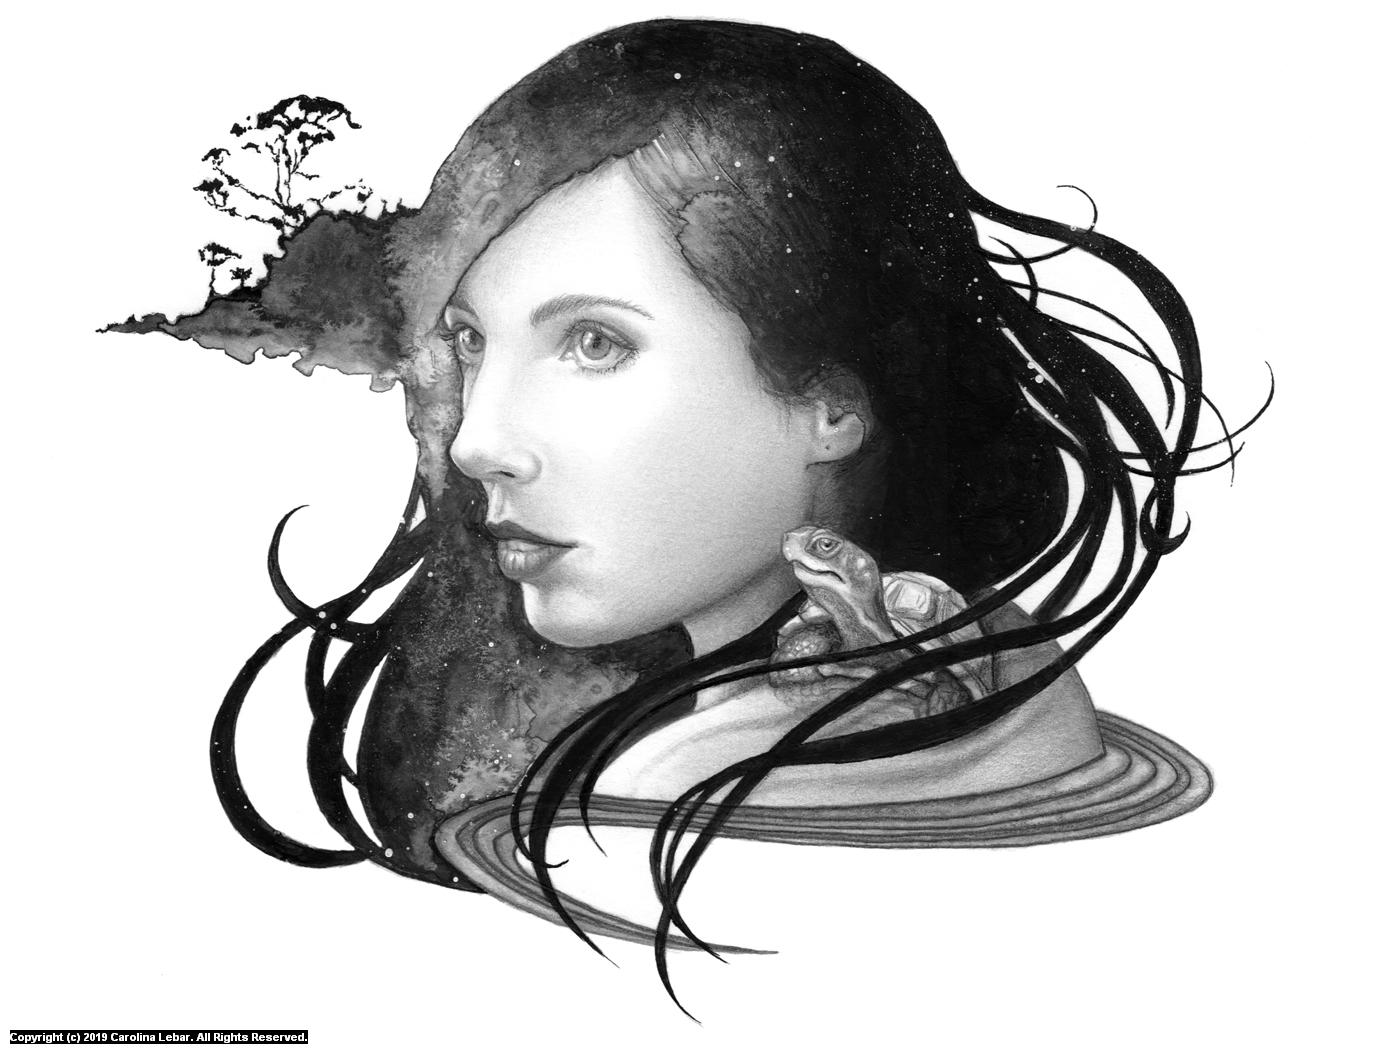 Gaia Artwork by Carolina Lebar